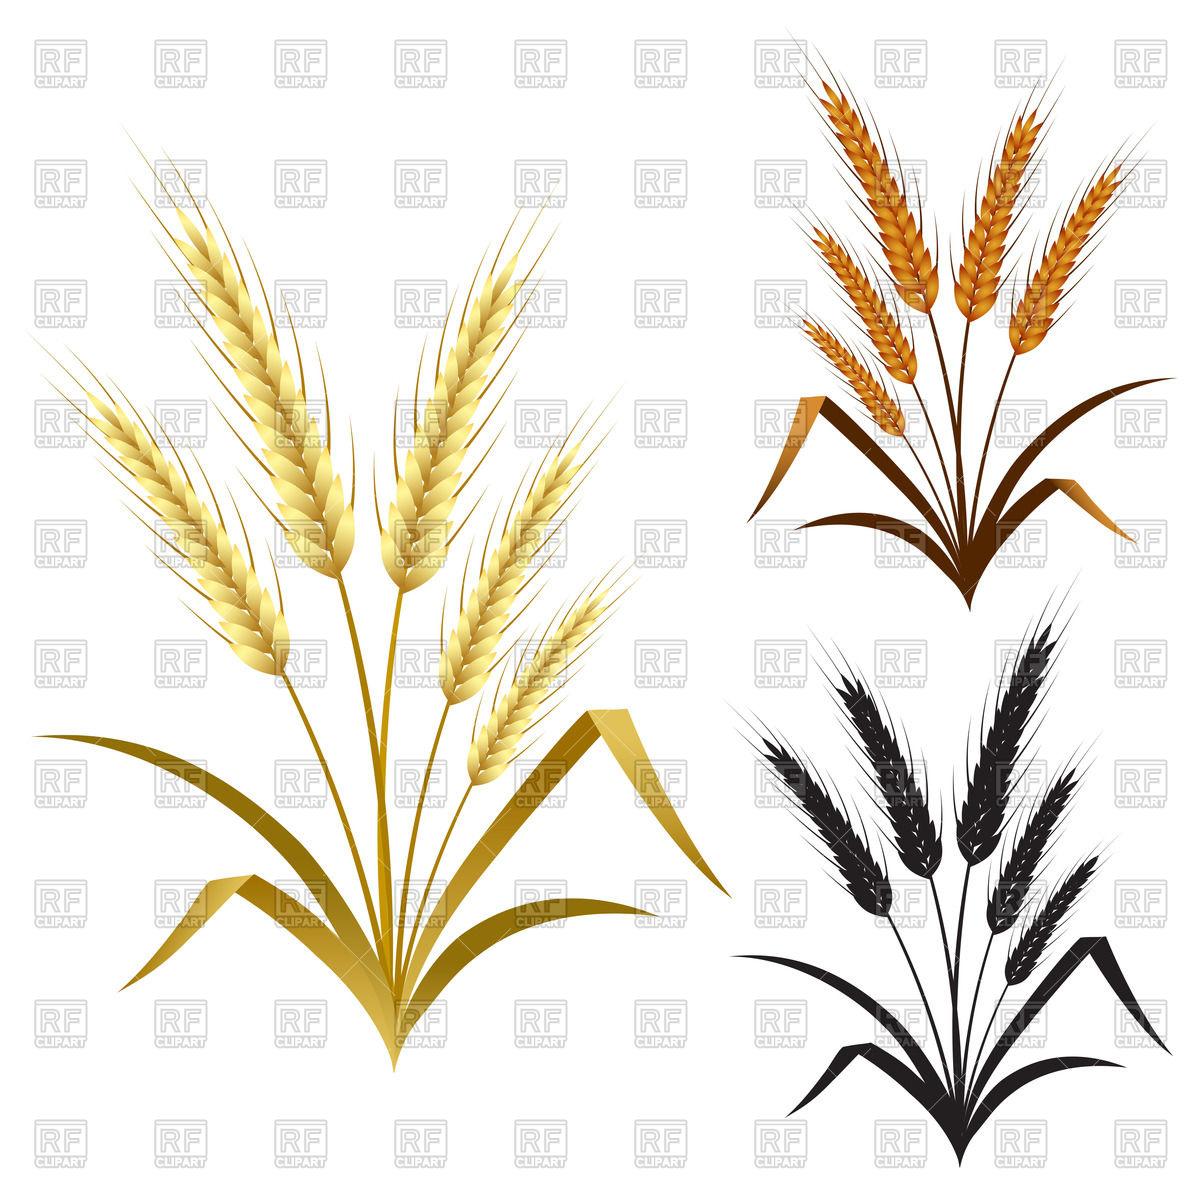 Ears of Wheat, barley and rye Vector Image #49710.